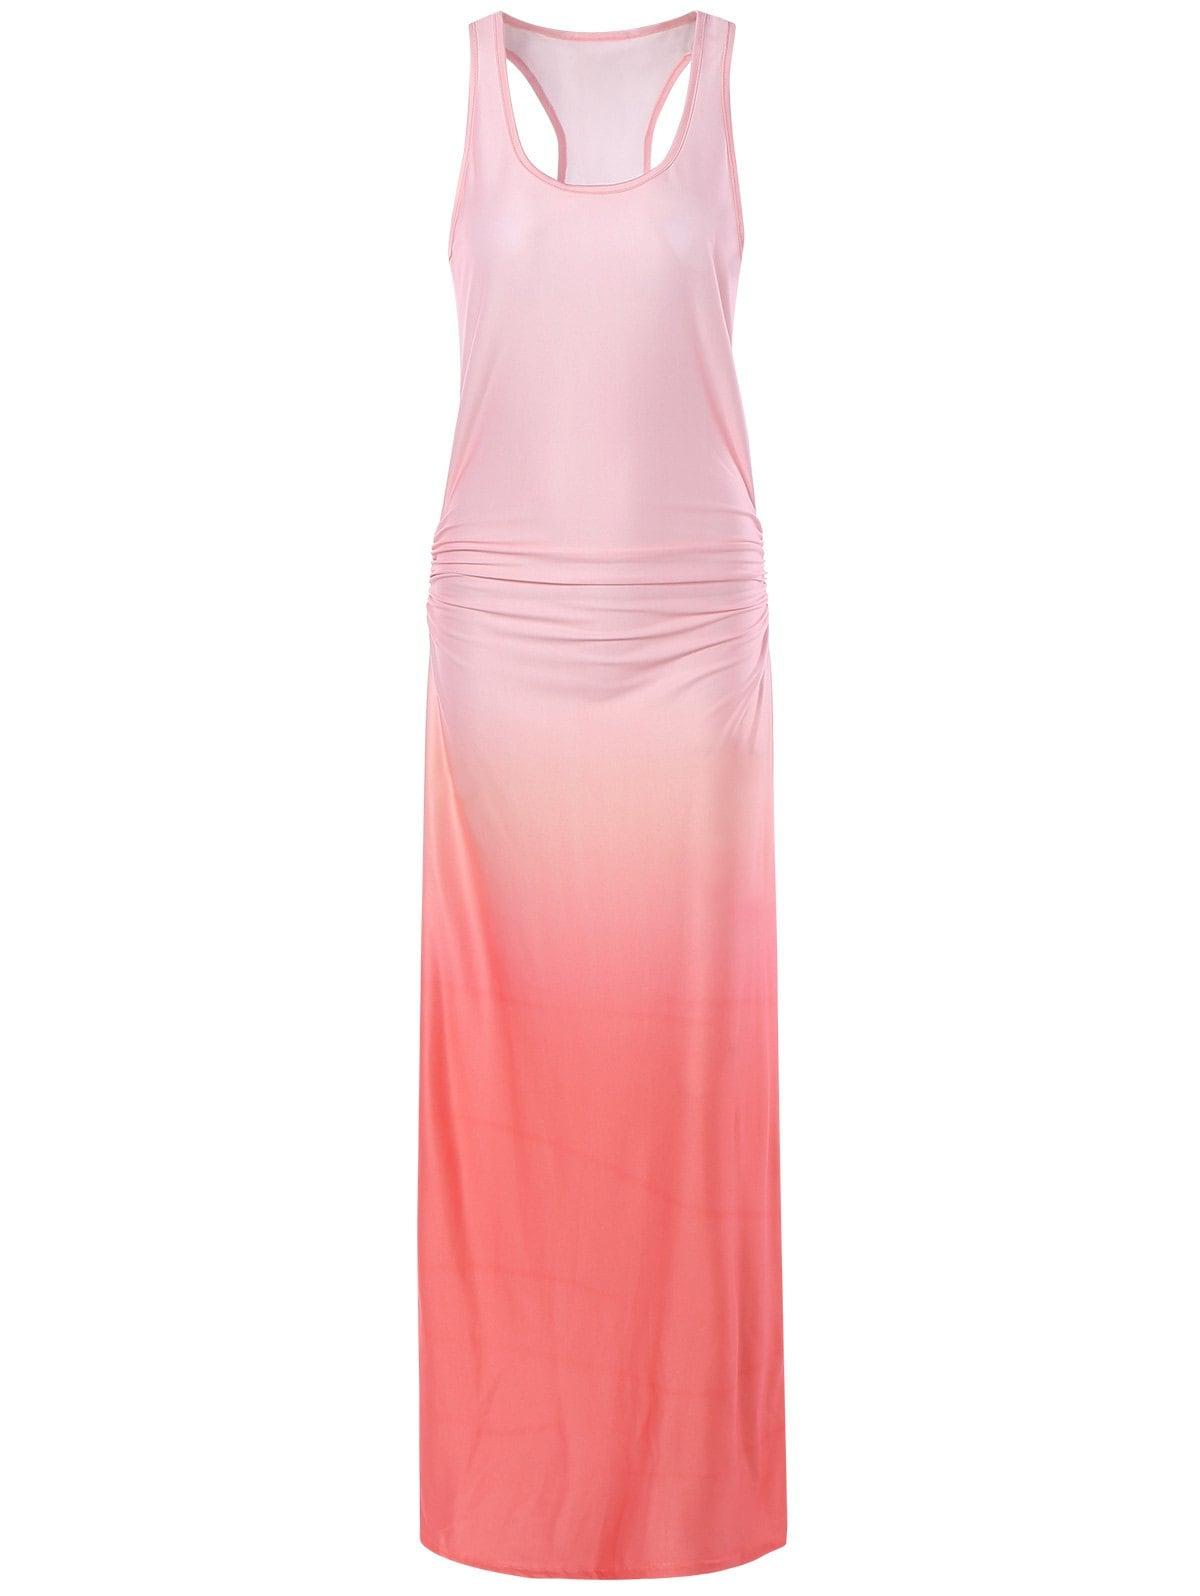 light pink casual dress photo - 1